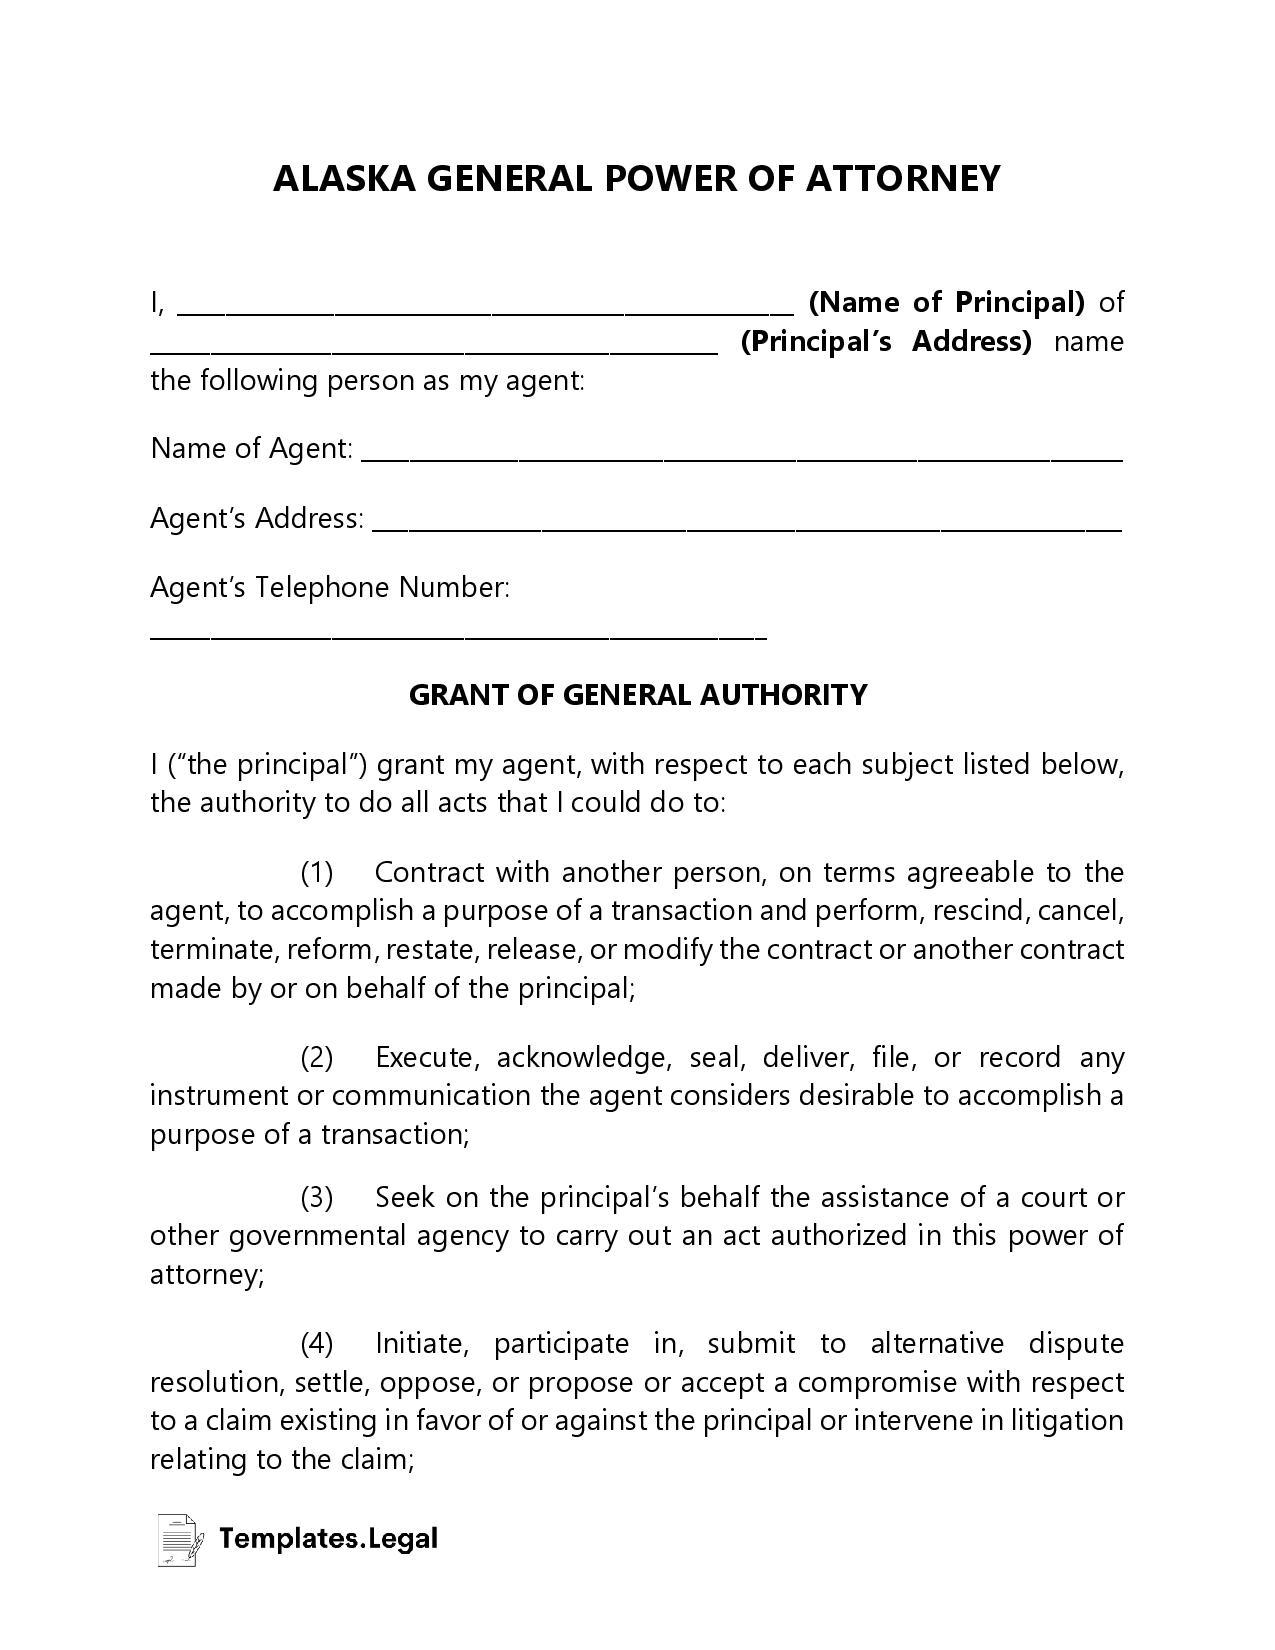 Alaska General Power of Attorney - Templates.Legal